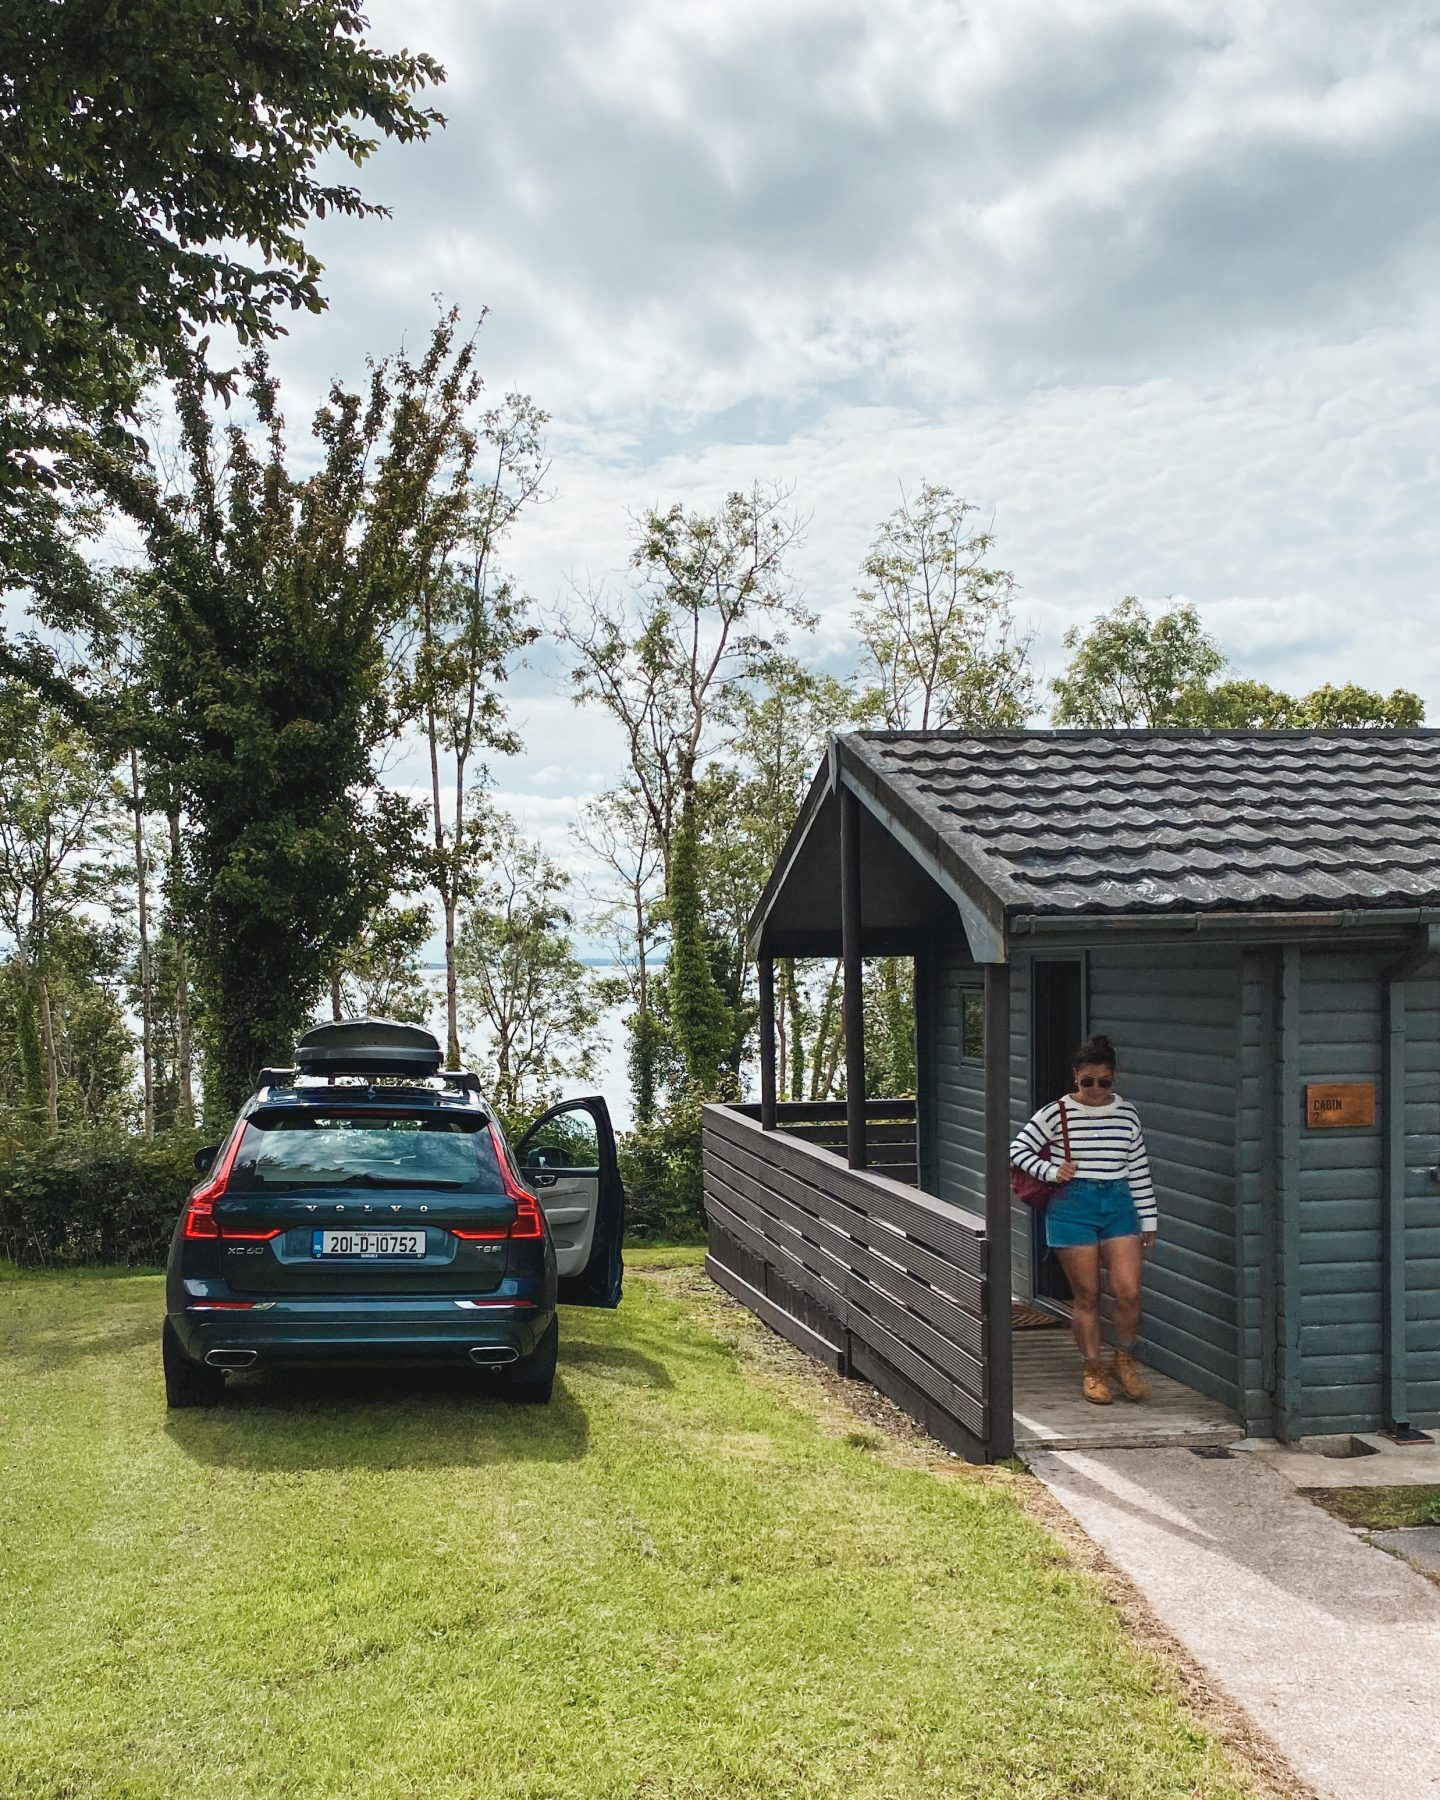 Volvo XC60 at Lusty Beg Island Resort